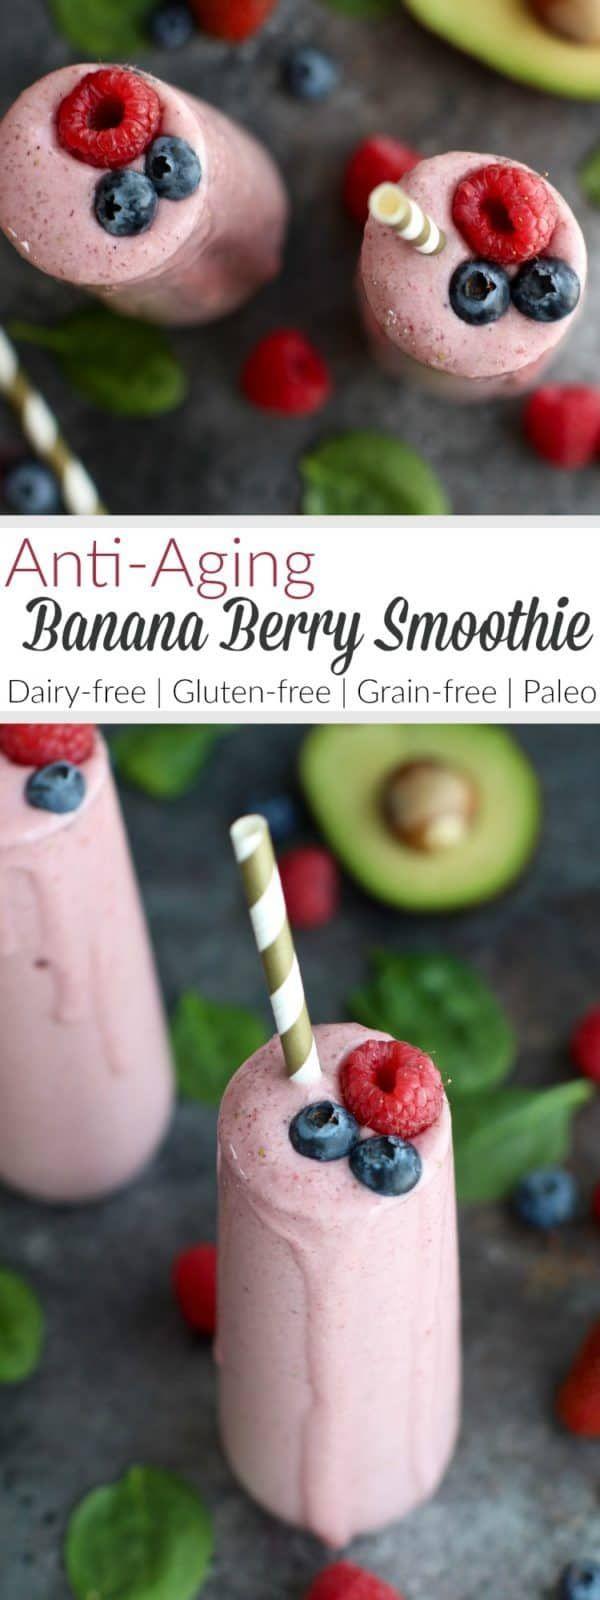 Anti-Aging Banana Berry Smoothie #dairyfreesmoothie